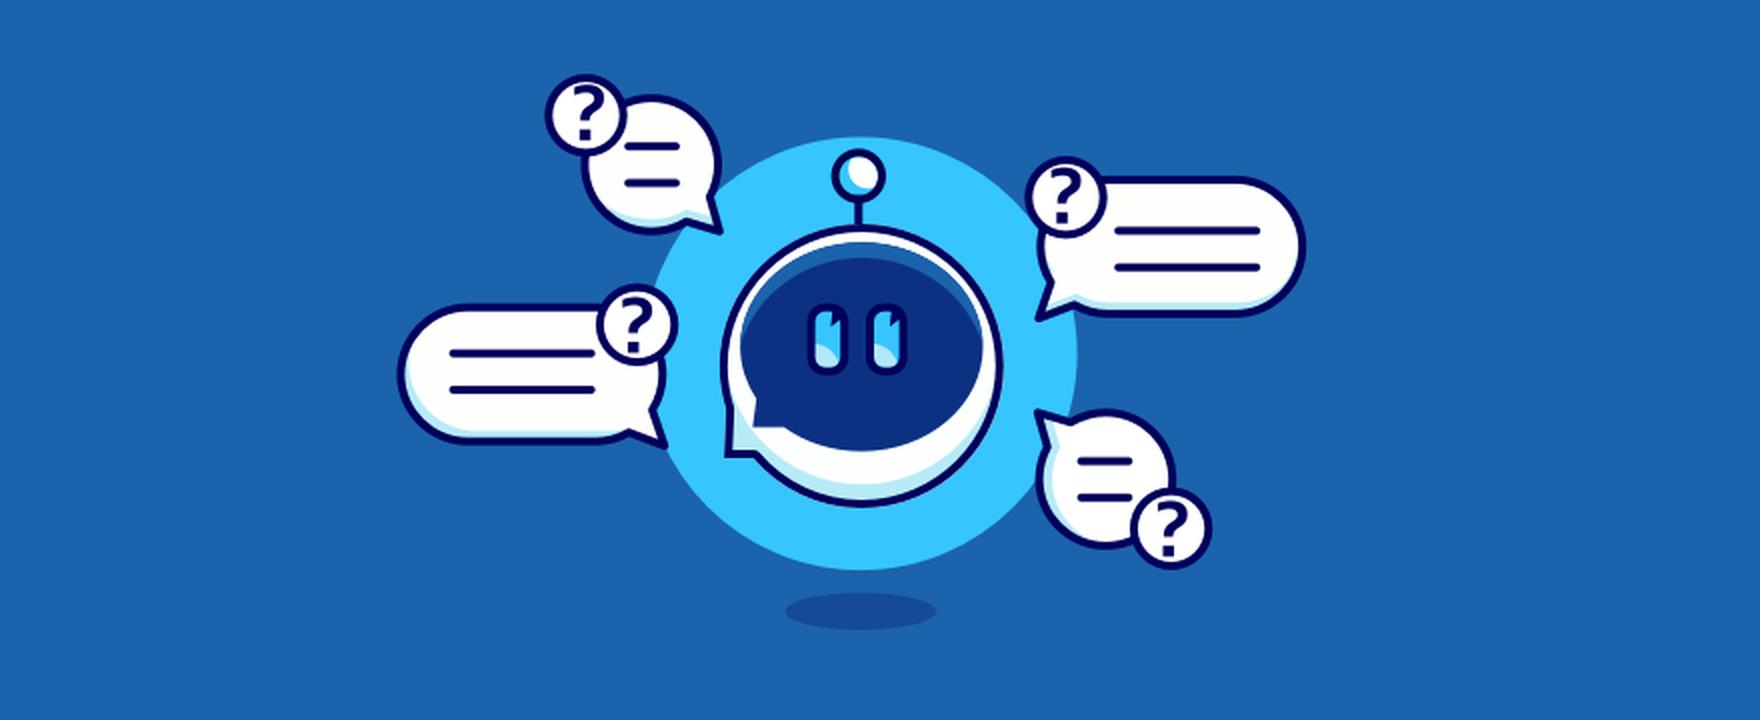 PeopleSoft HCM Chatbots